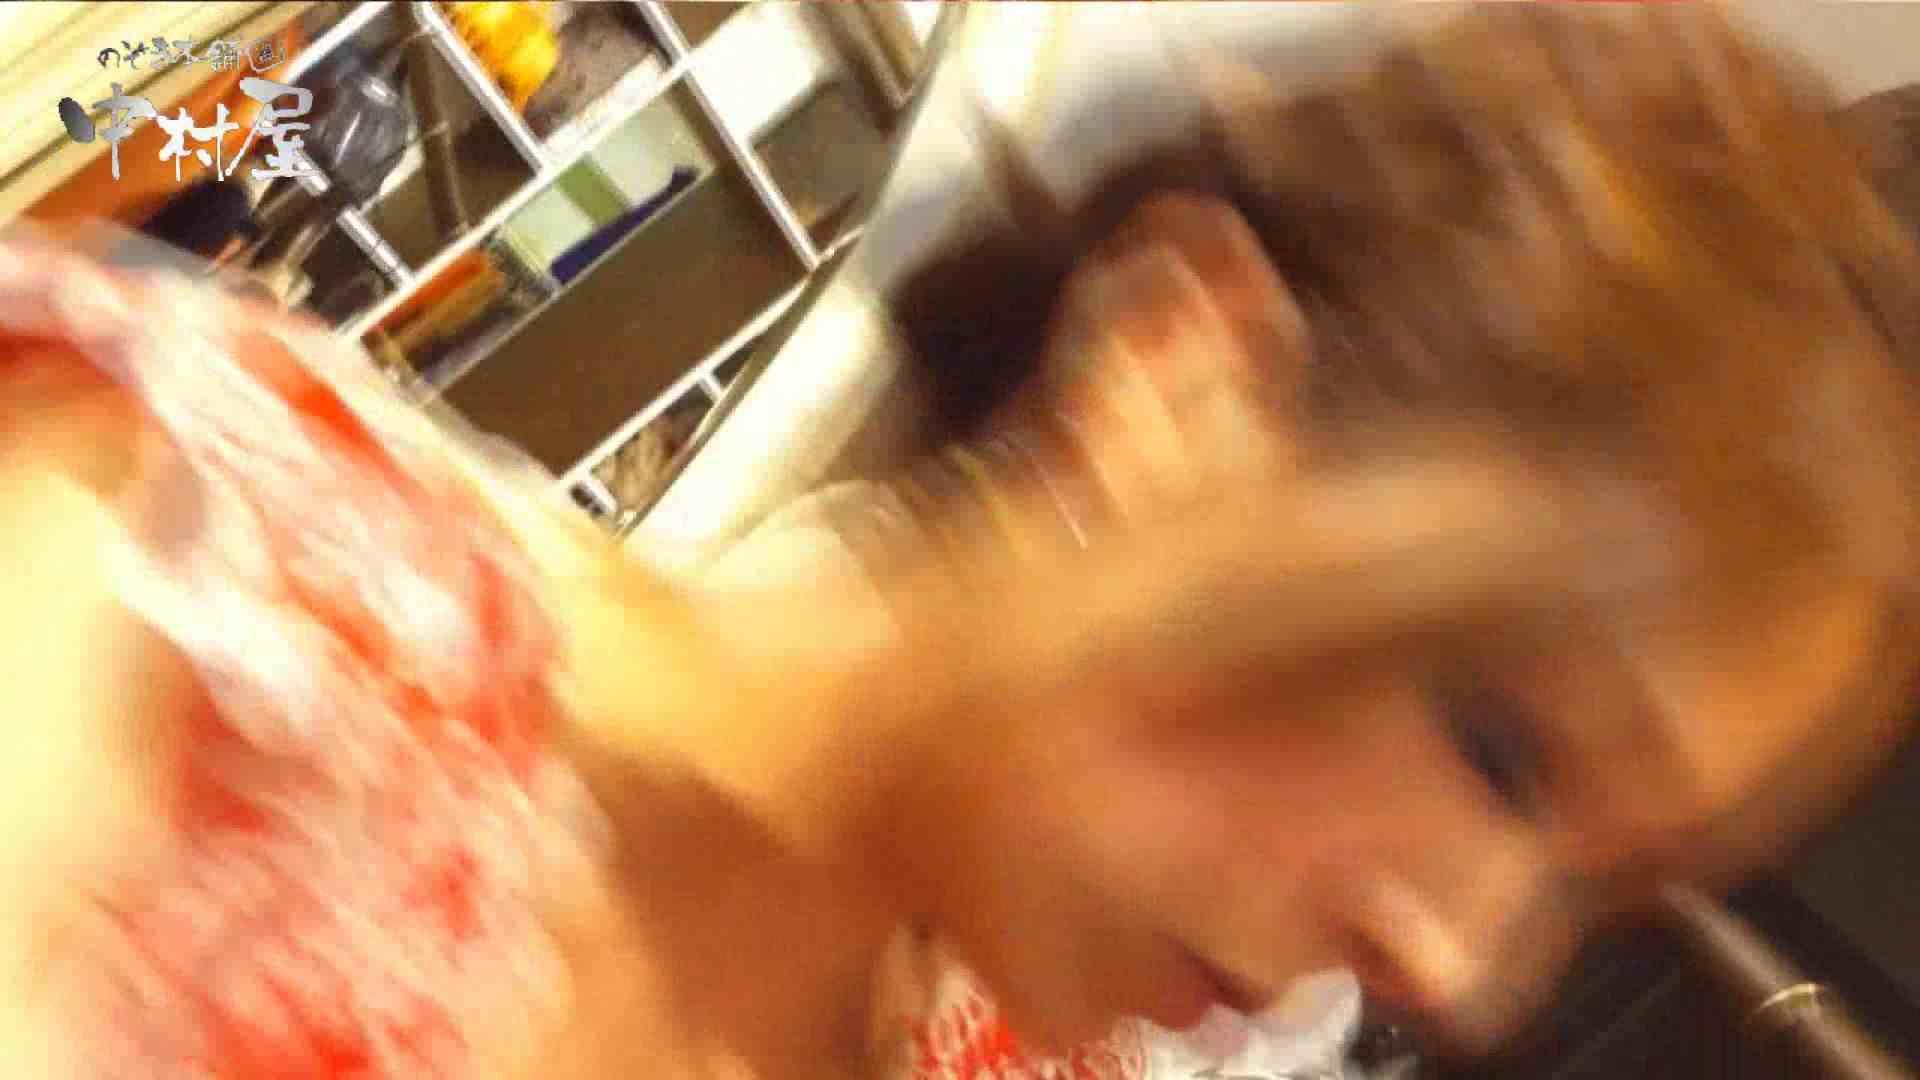 vol.43 可愛いカリスマ店員限定‼胸チラ&パンチラ 美脚おねーさんの胸元ゲット! チラ アダルト動画キャプチャ 68PIX 3